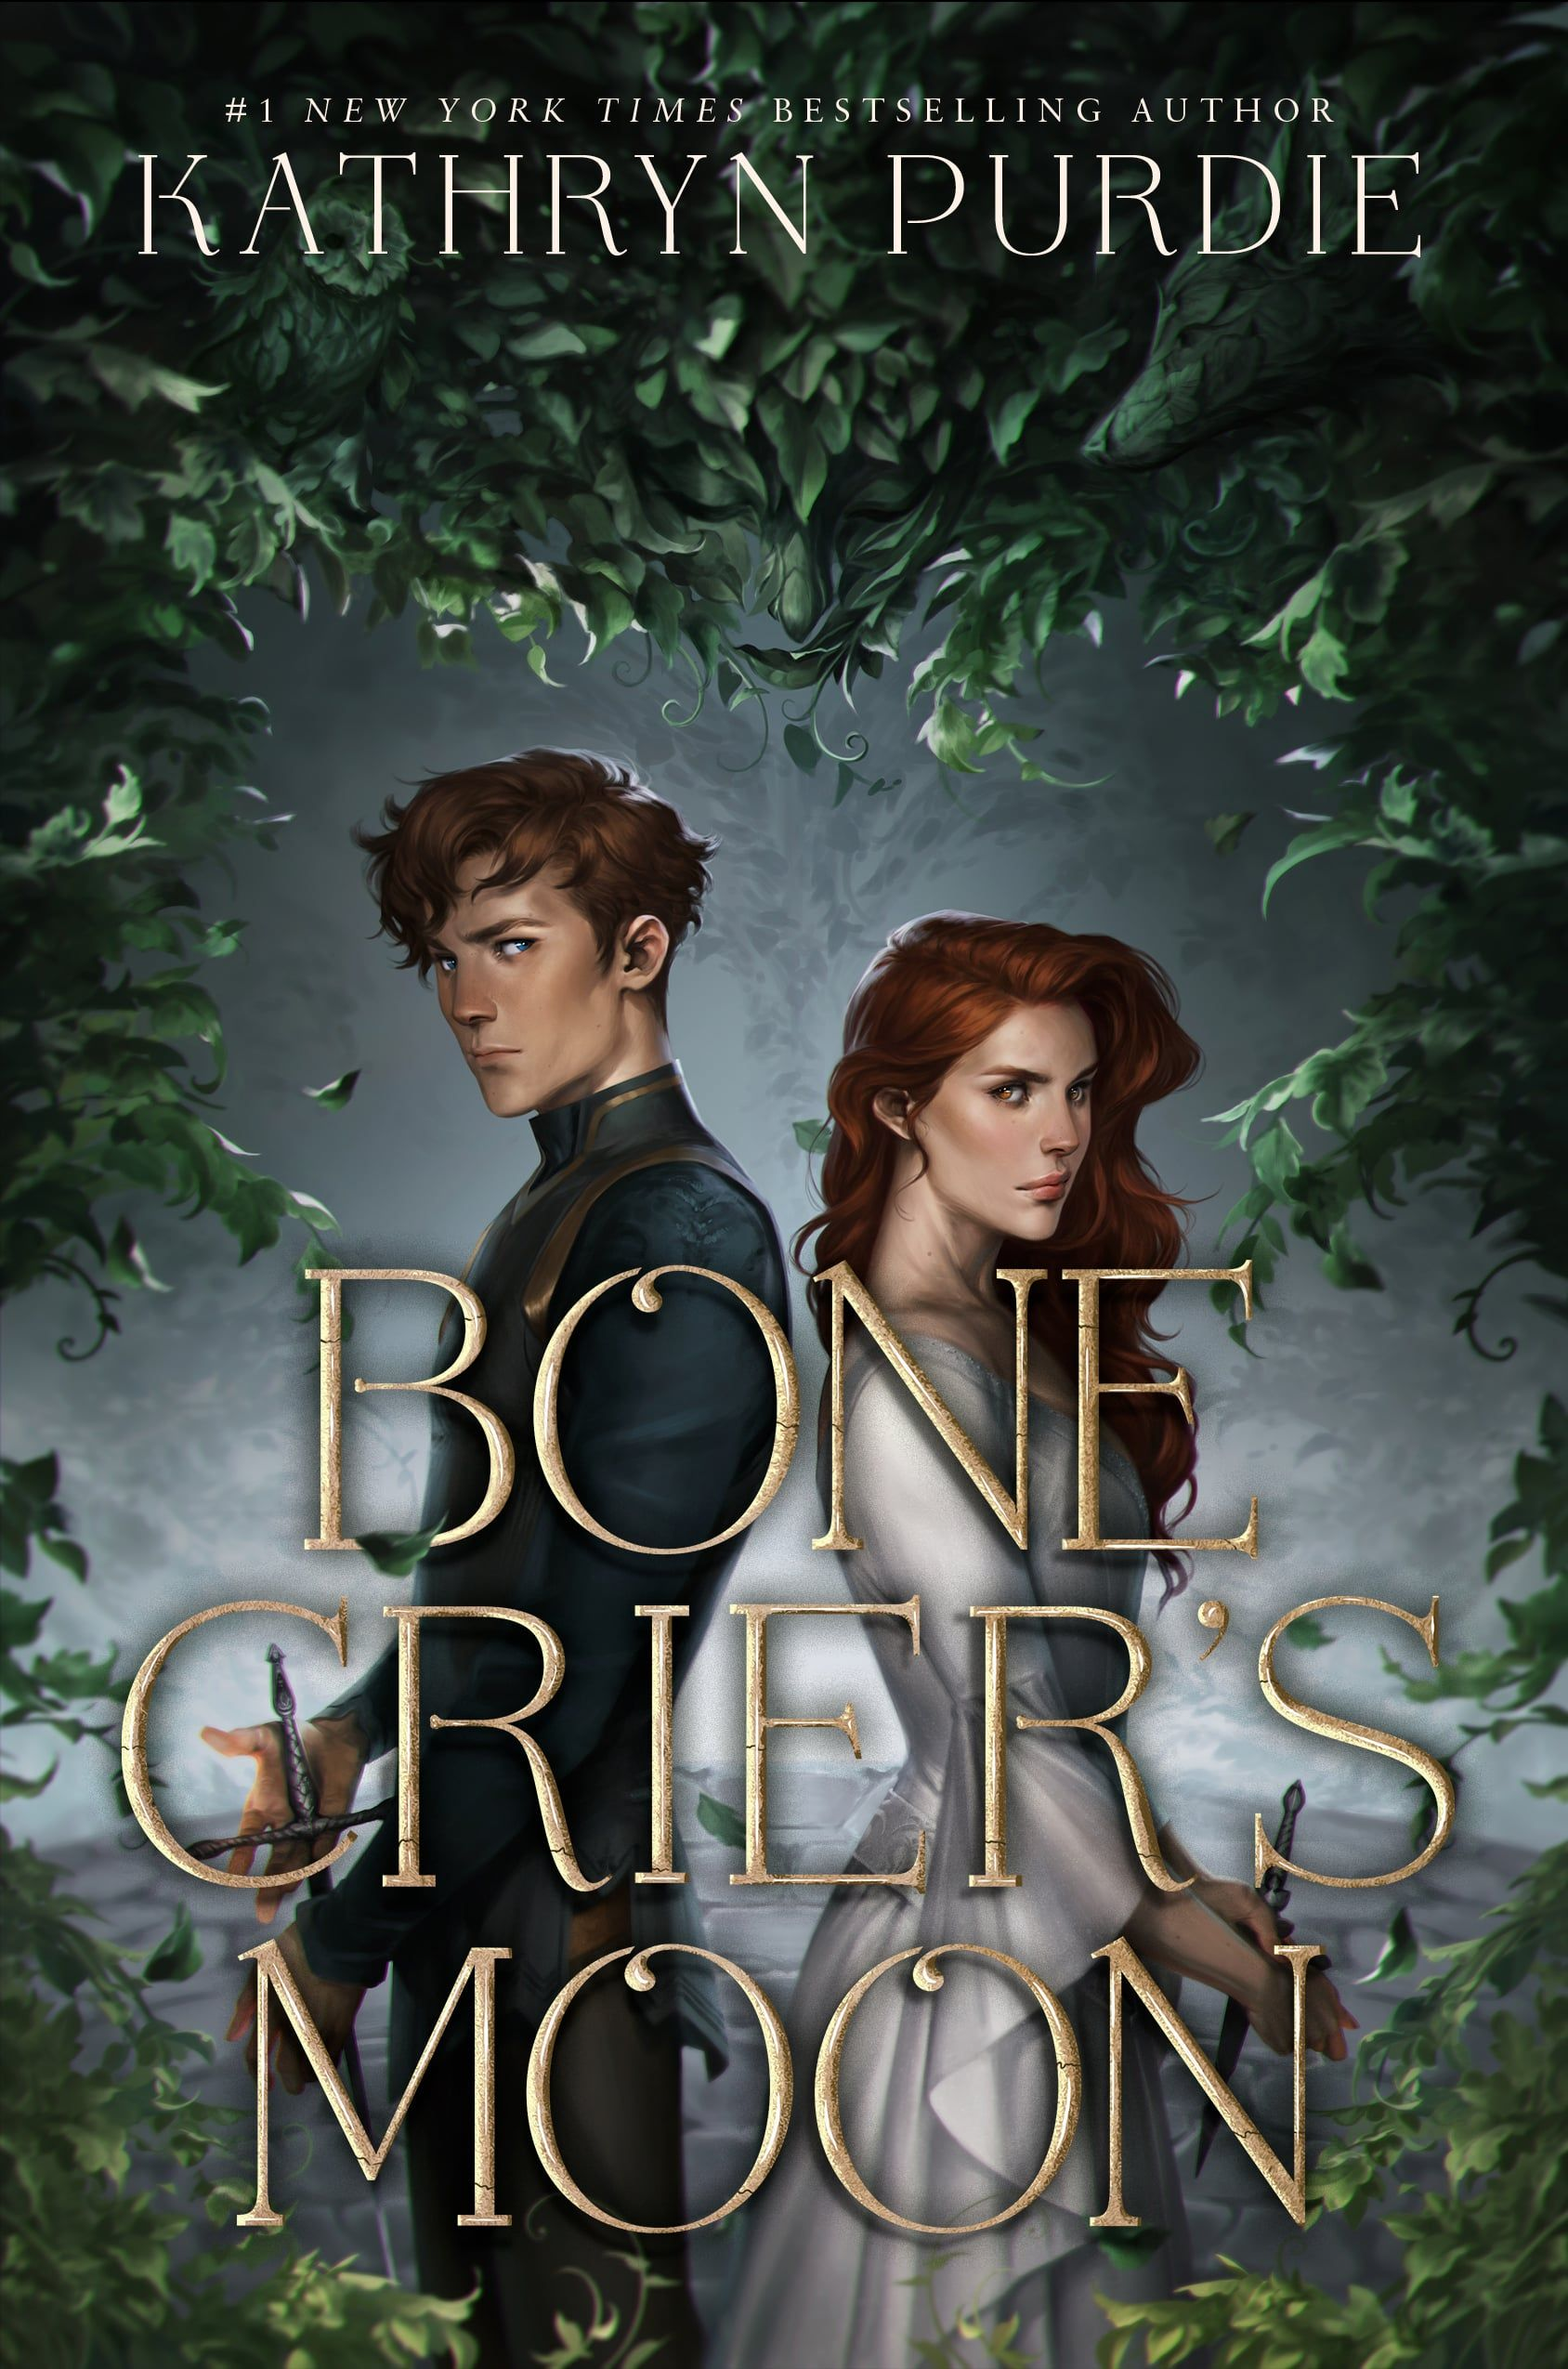 Coverreveal Bone Crier S Moon Bone Crier S Moon 1 By Kathryn Purdie Ya Book Covers Fantasy Books Fantasy Book Covers